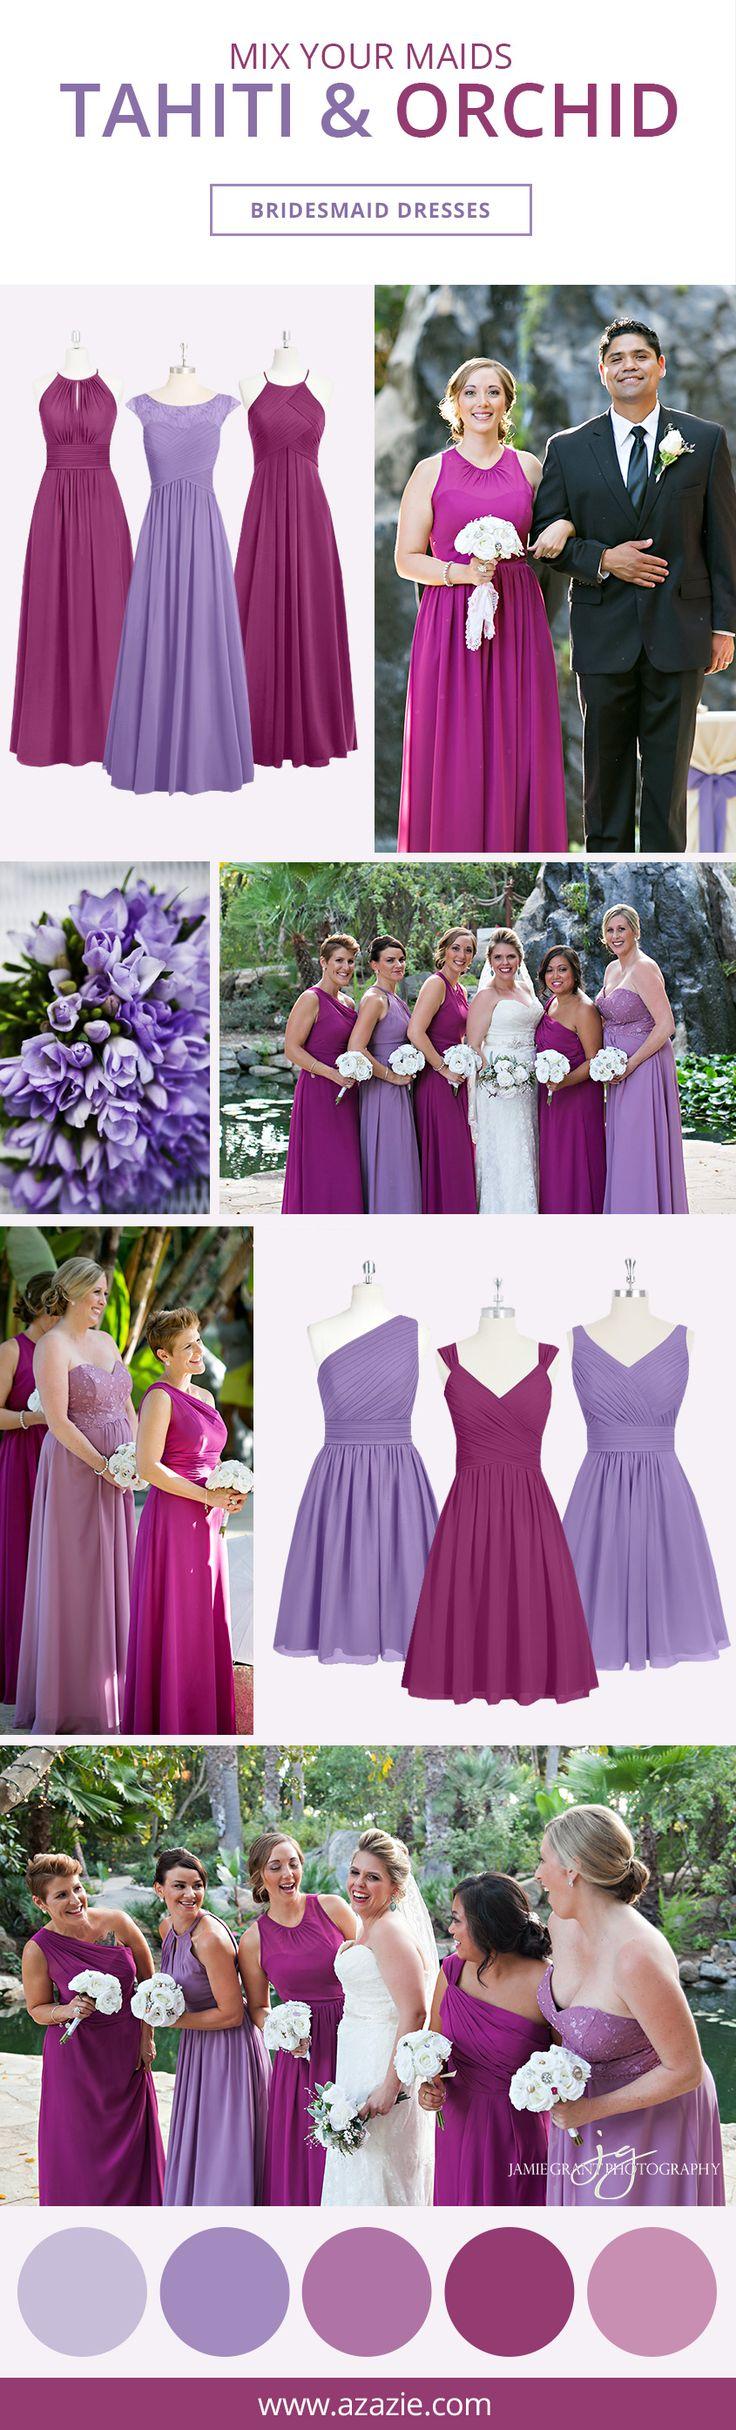 223 best Bridesmaid dresses images on Pinterest | Flower girls ...